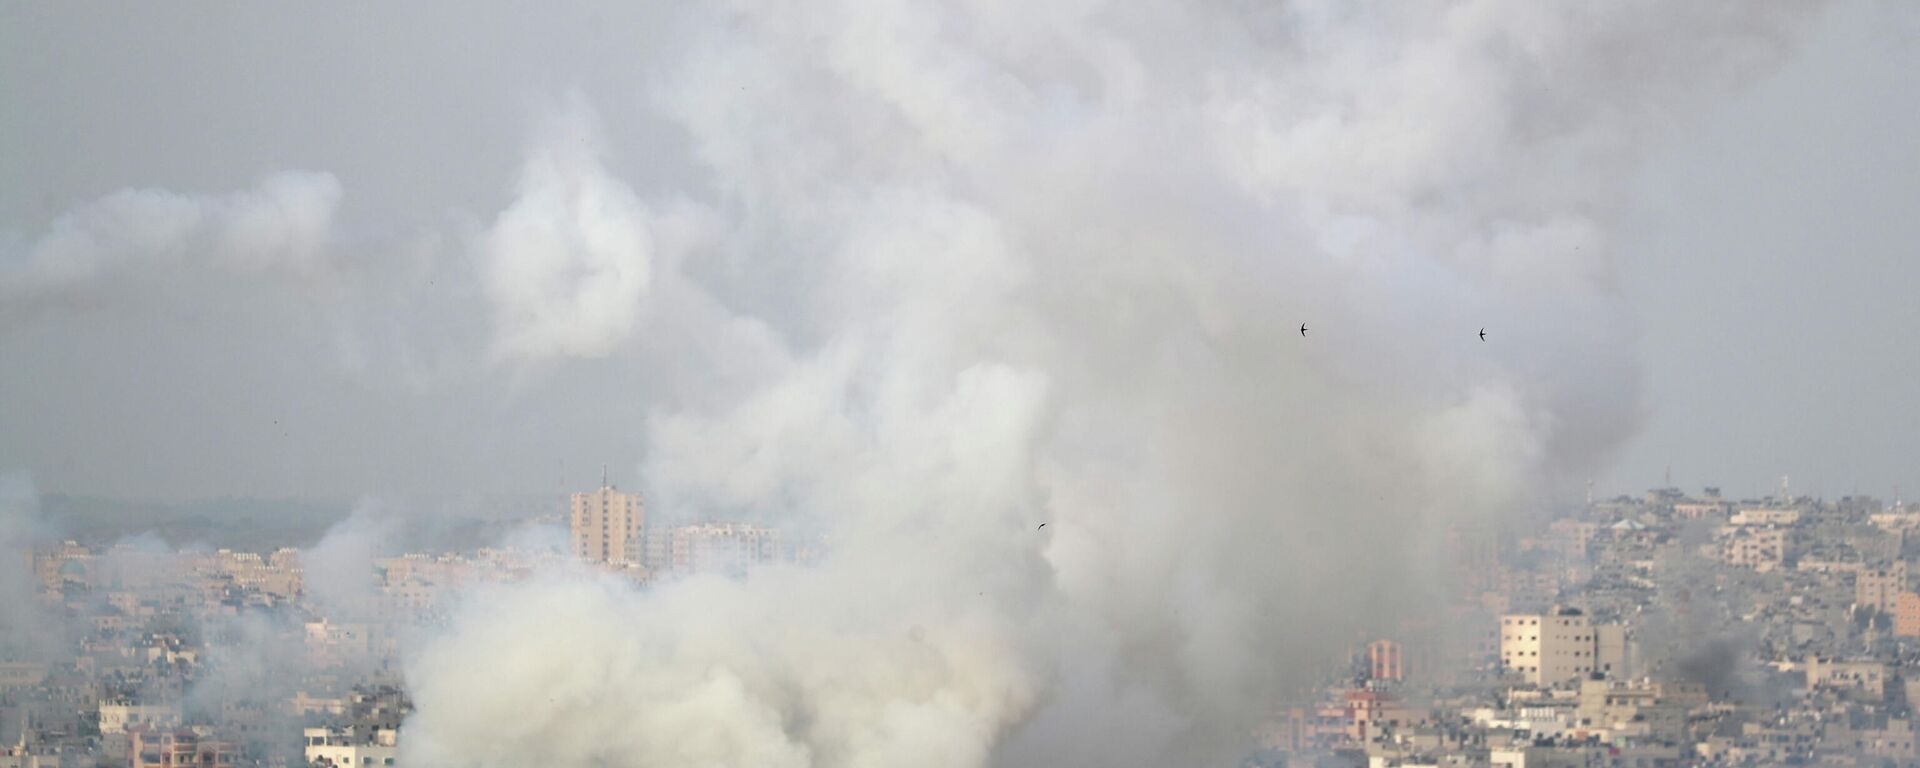 Un ataque aéreo en Gaza - Sputnik Mundo, 1920, 10.05.2021